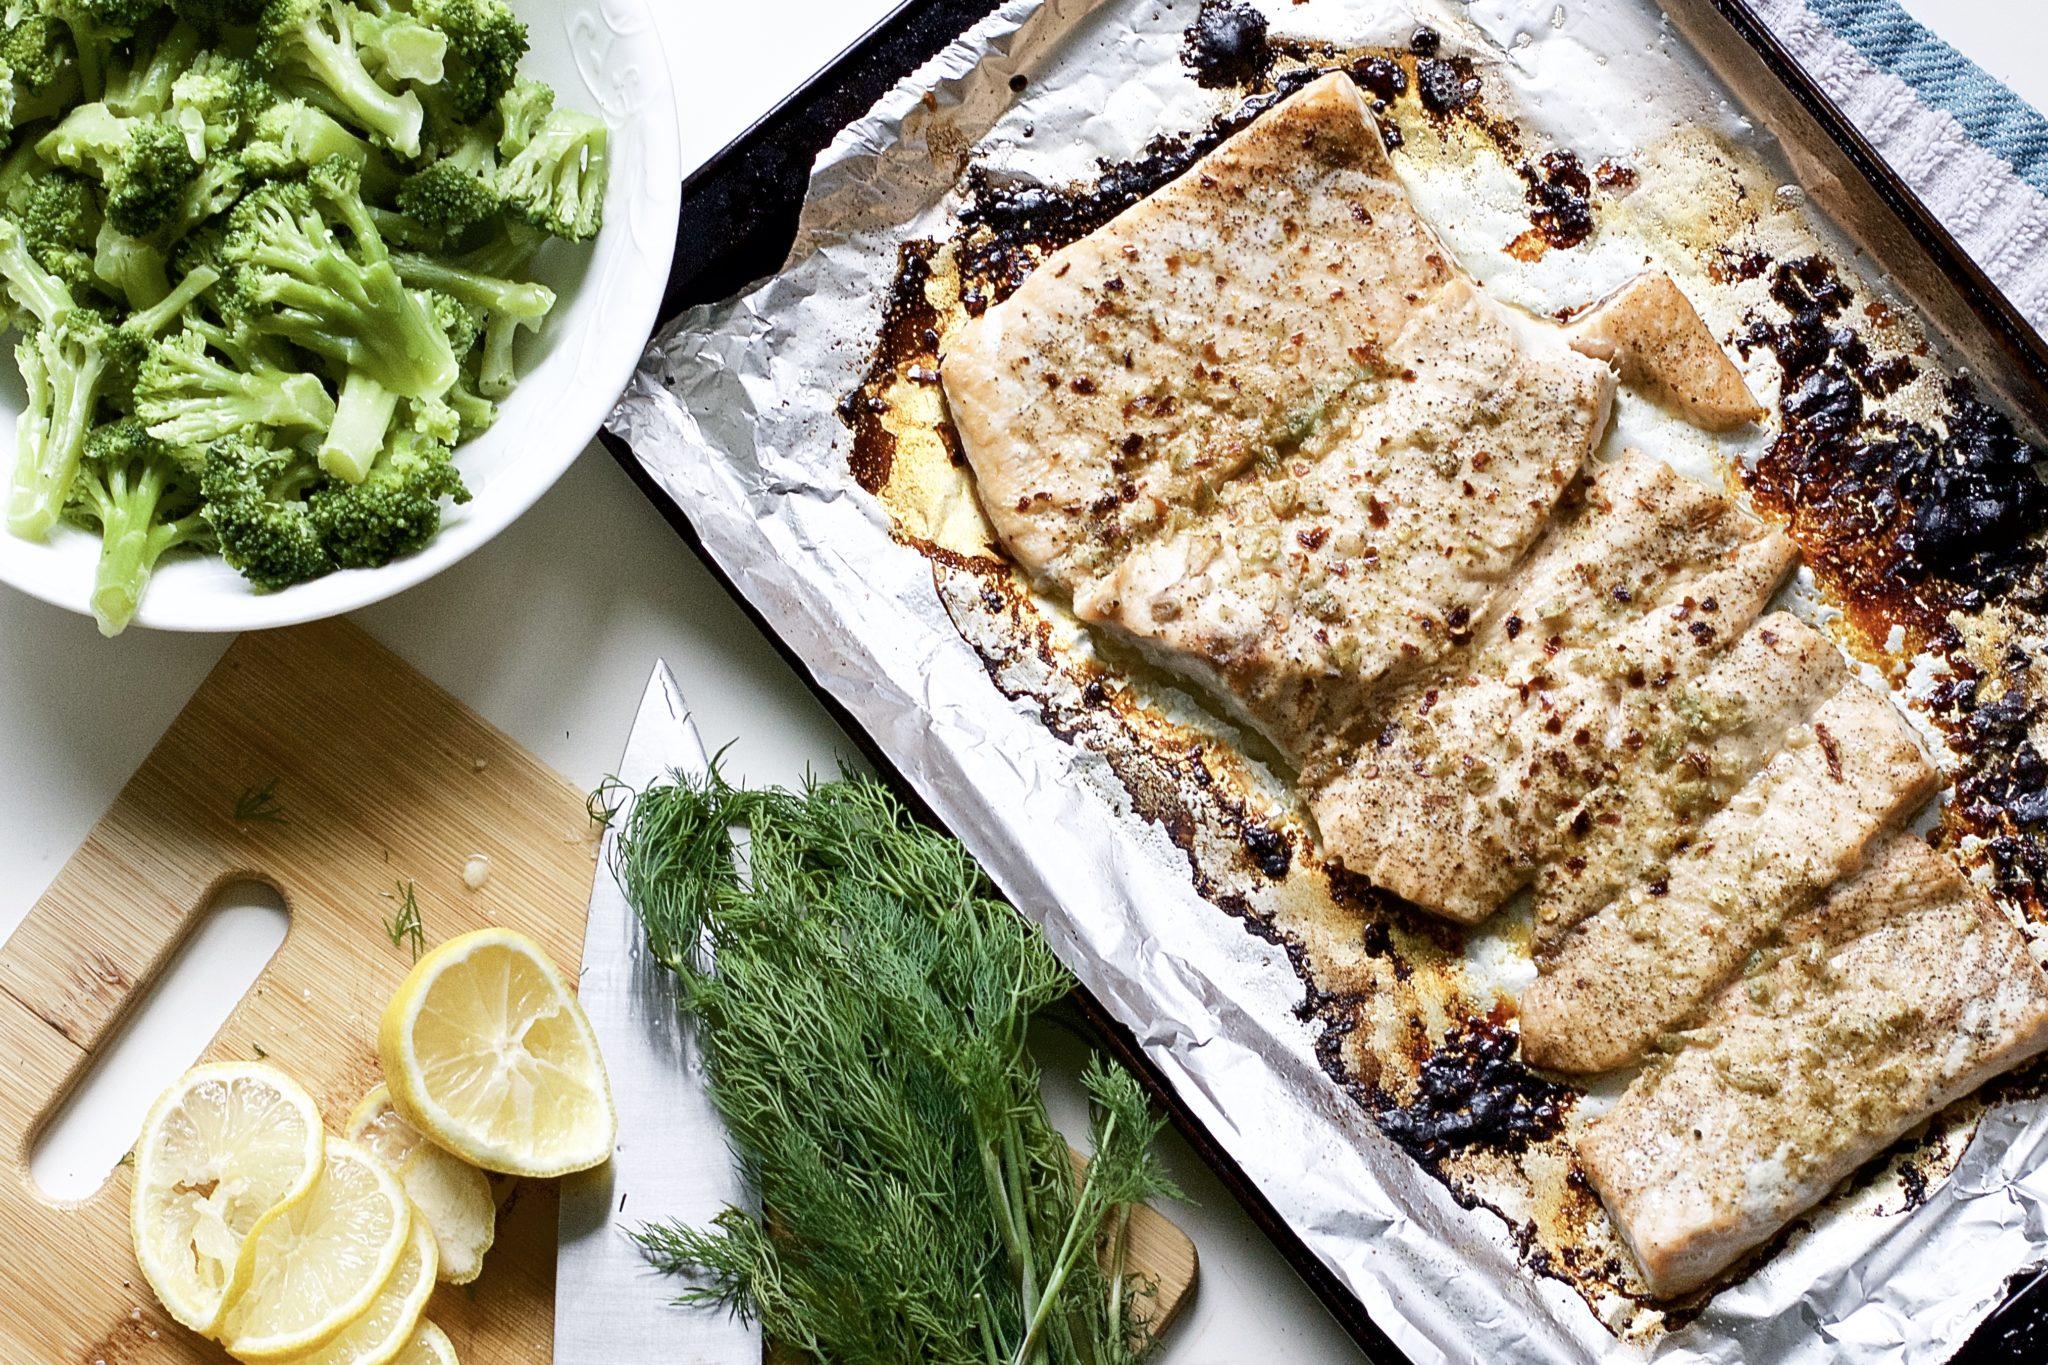 Lemon and Garlic Butter Salmon (Gluten-Free, Paleo, Whole 30)